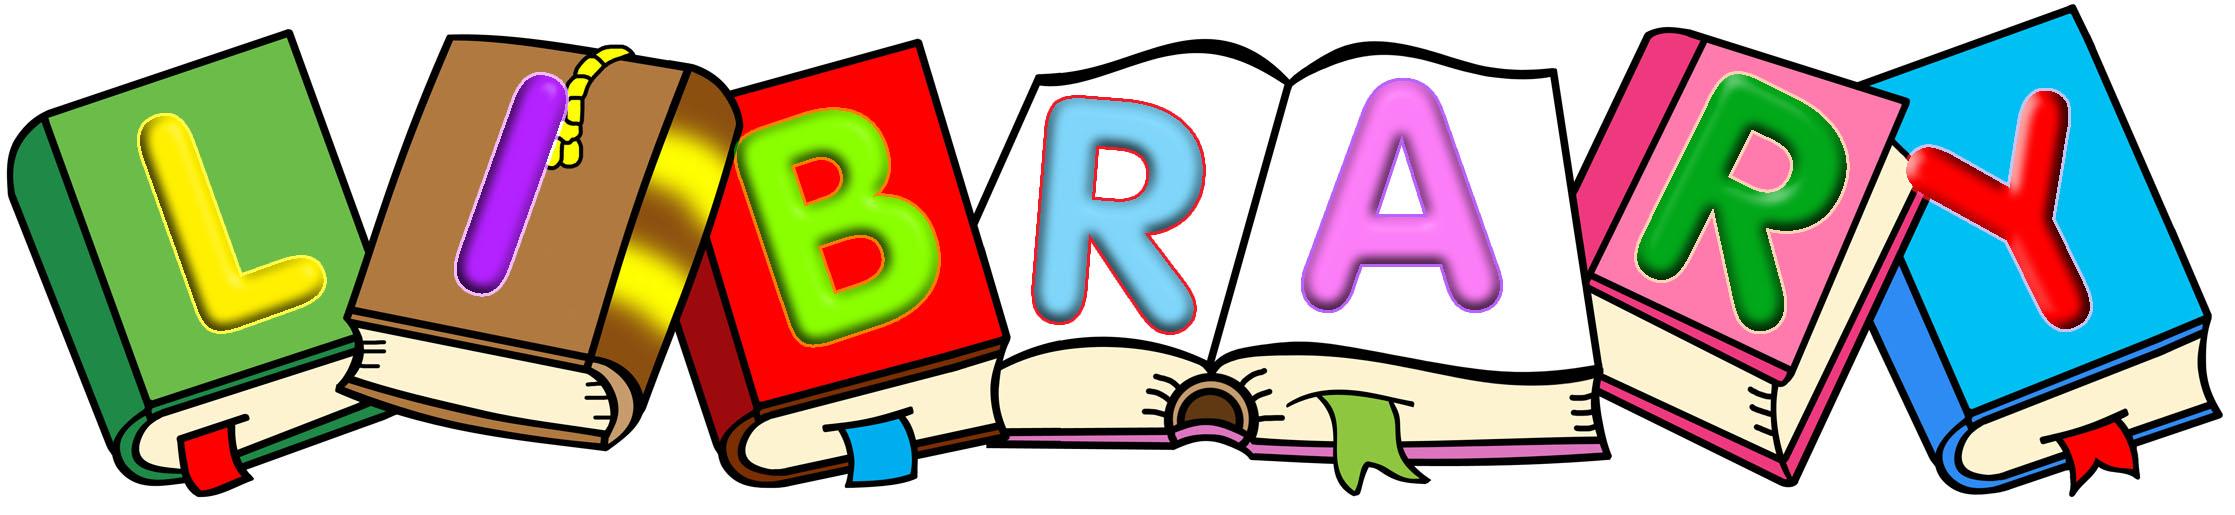 Library clip art symbols bing images